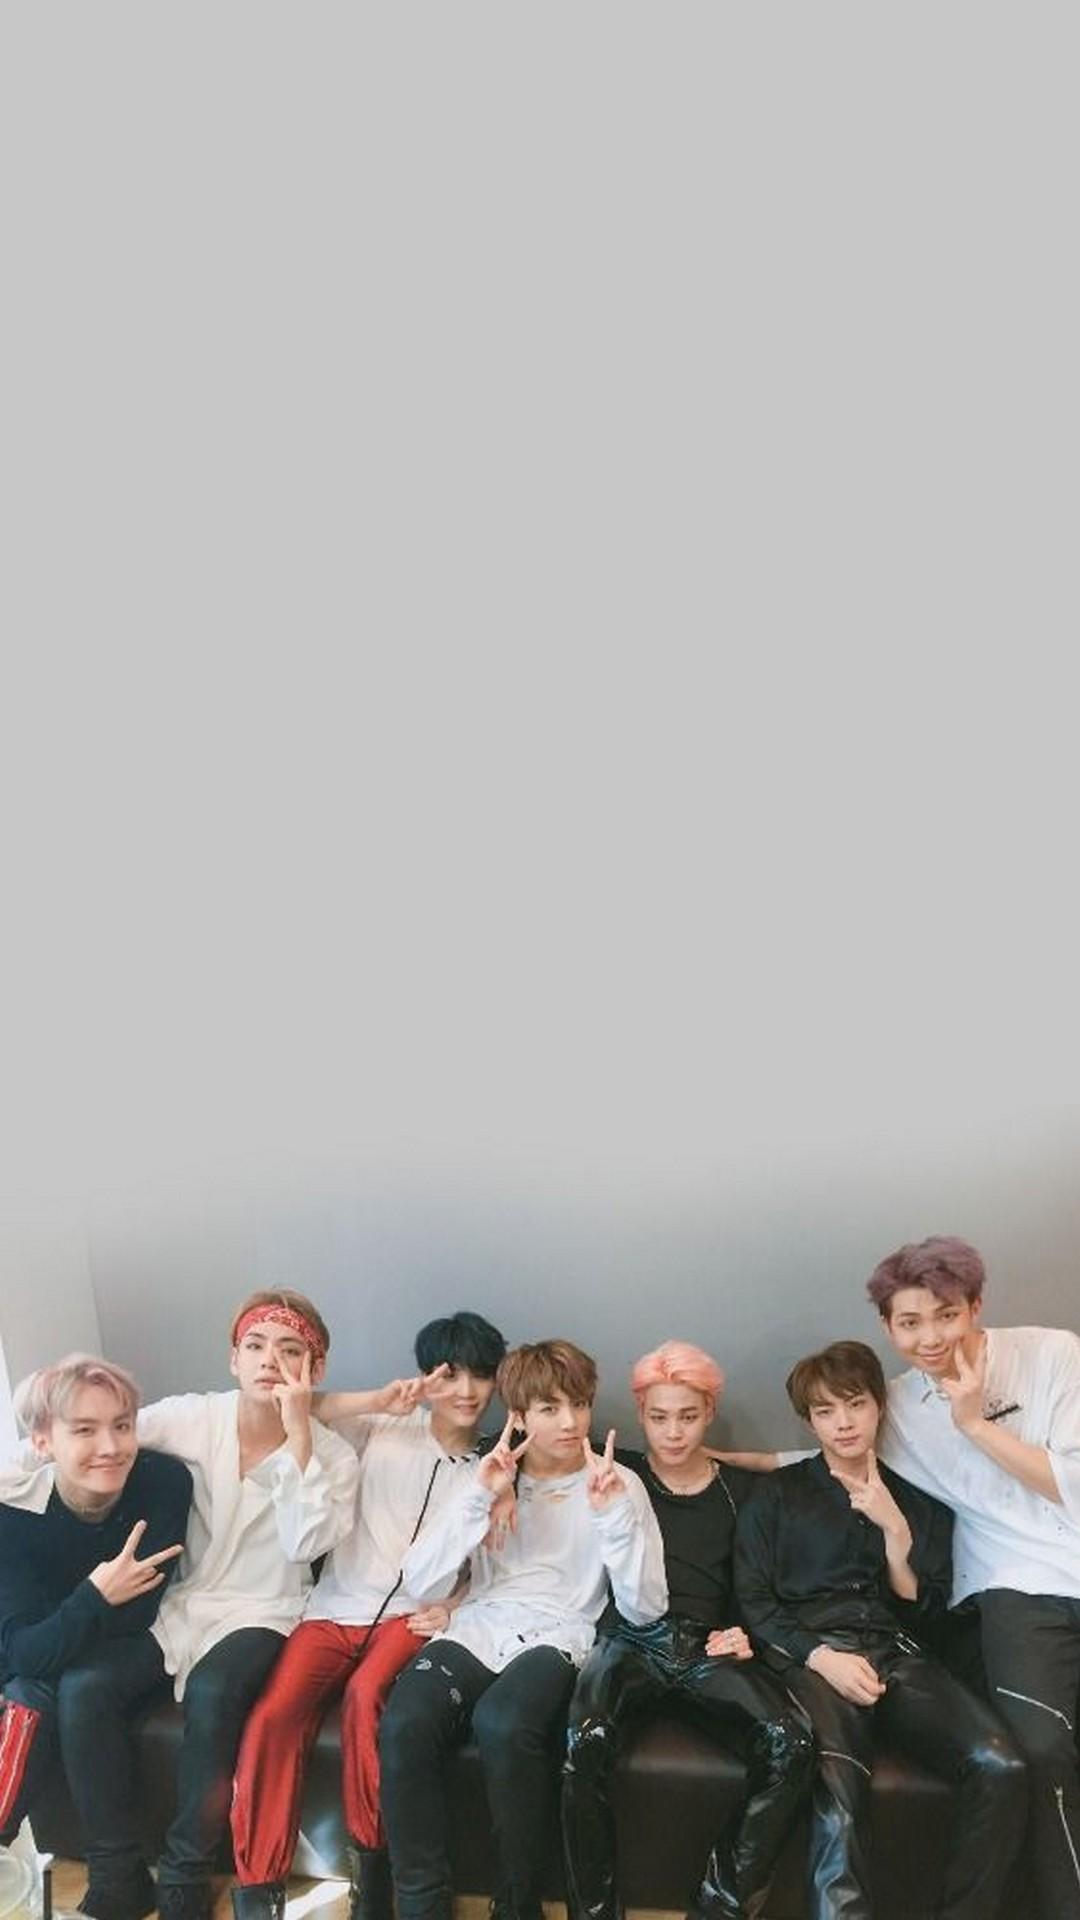 Look At Them Bts Lockscreen Group 452844 Hd Wallpaper